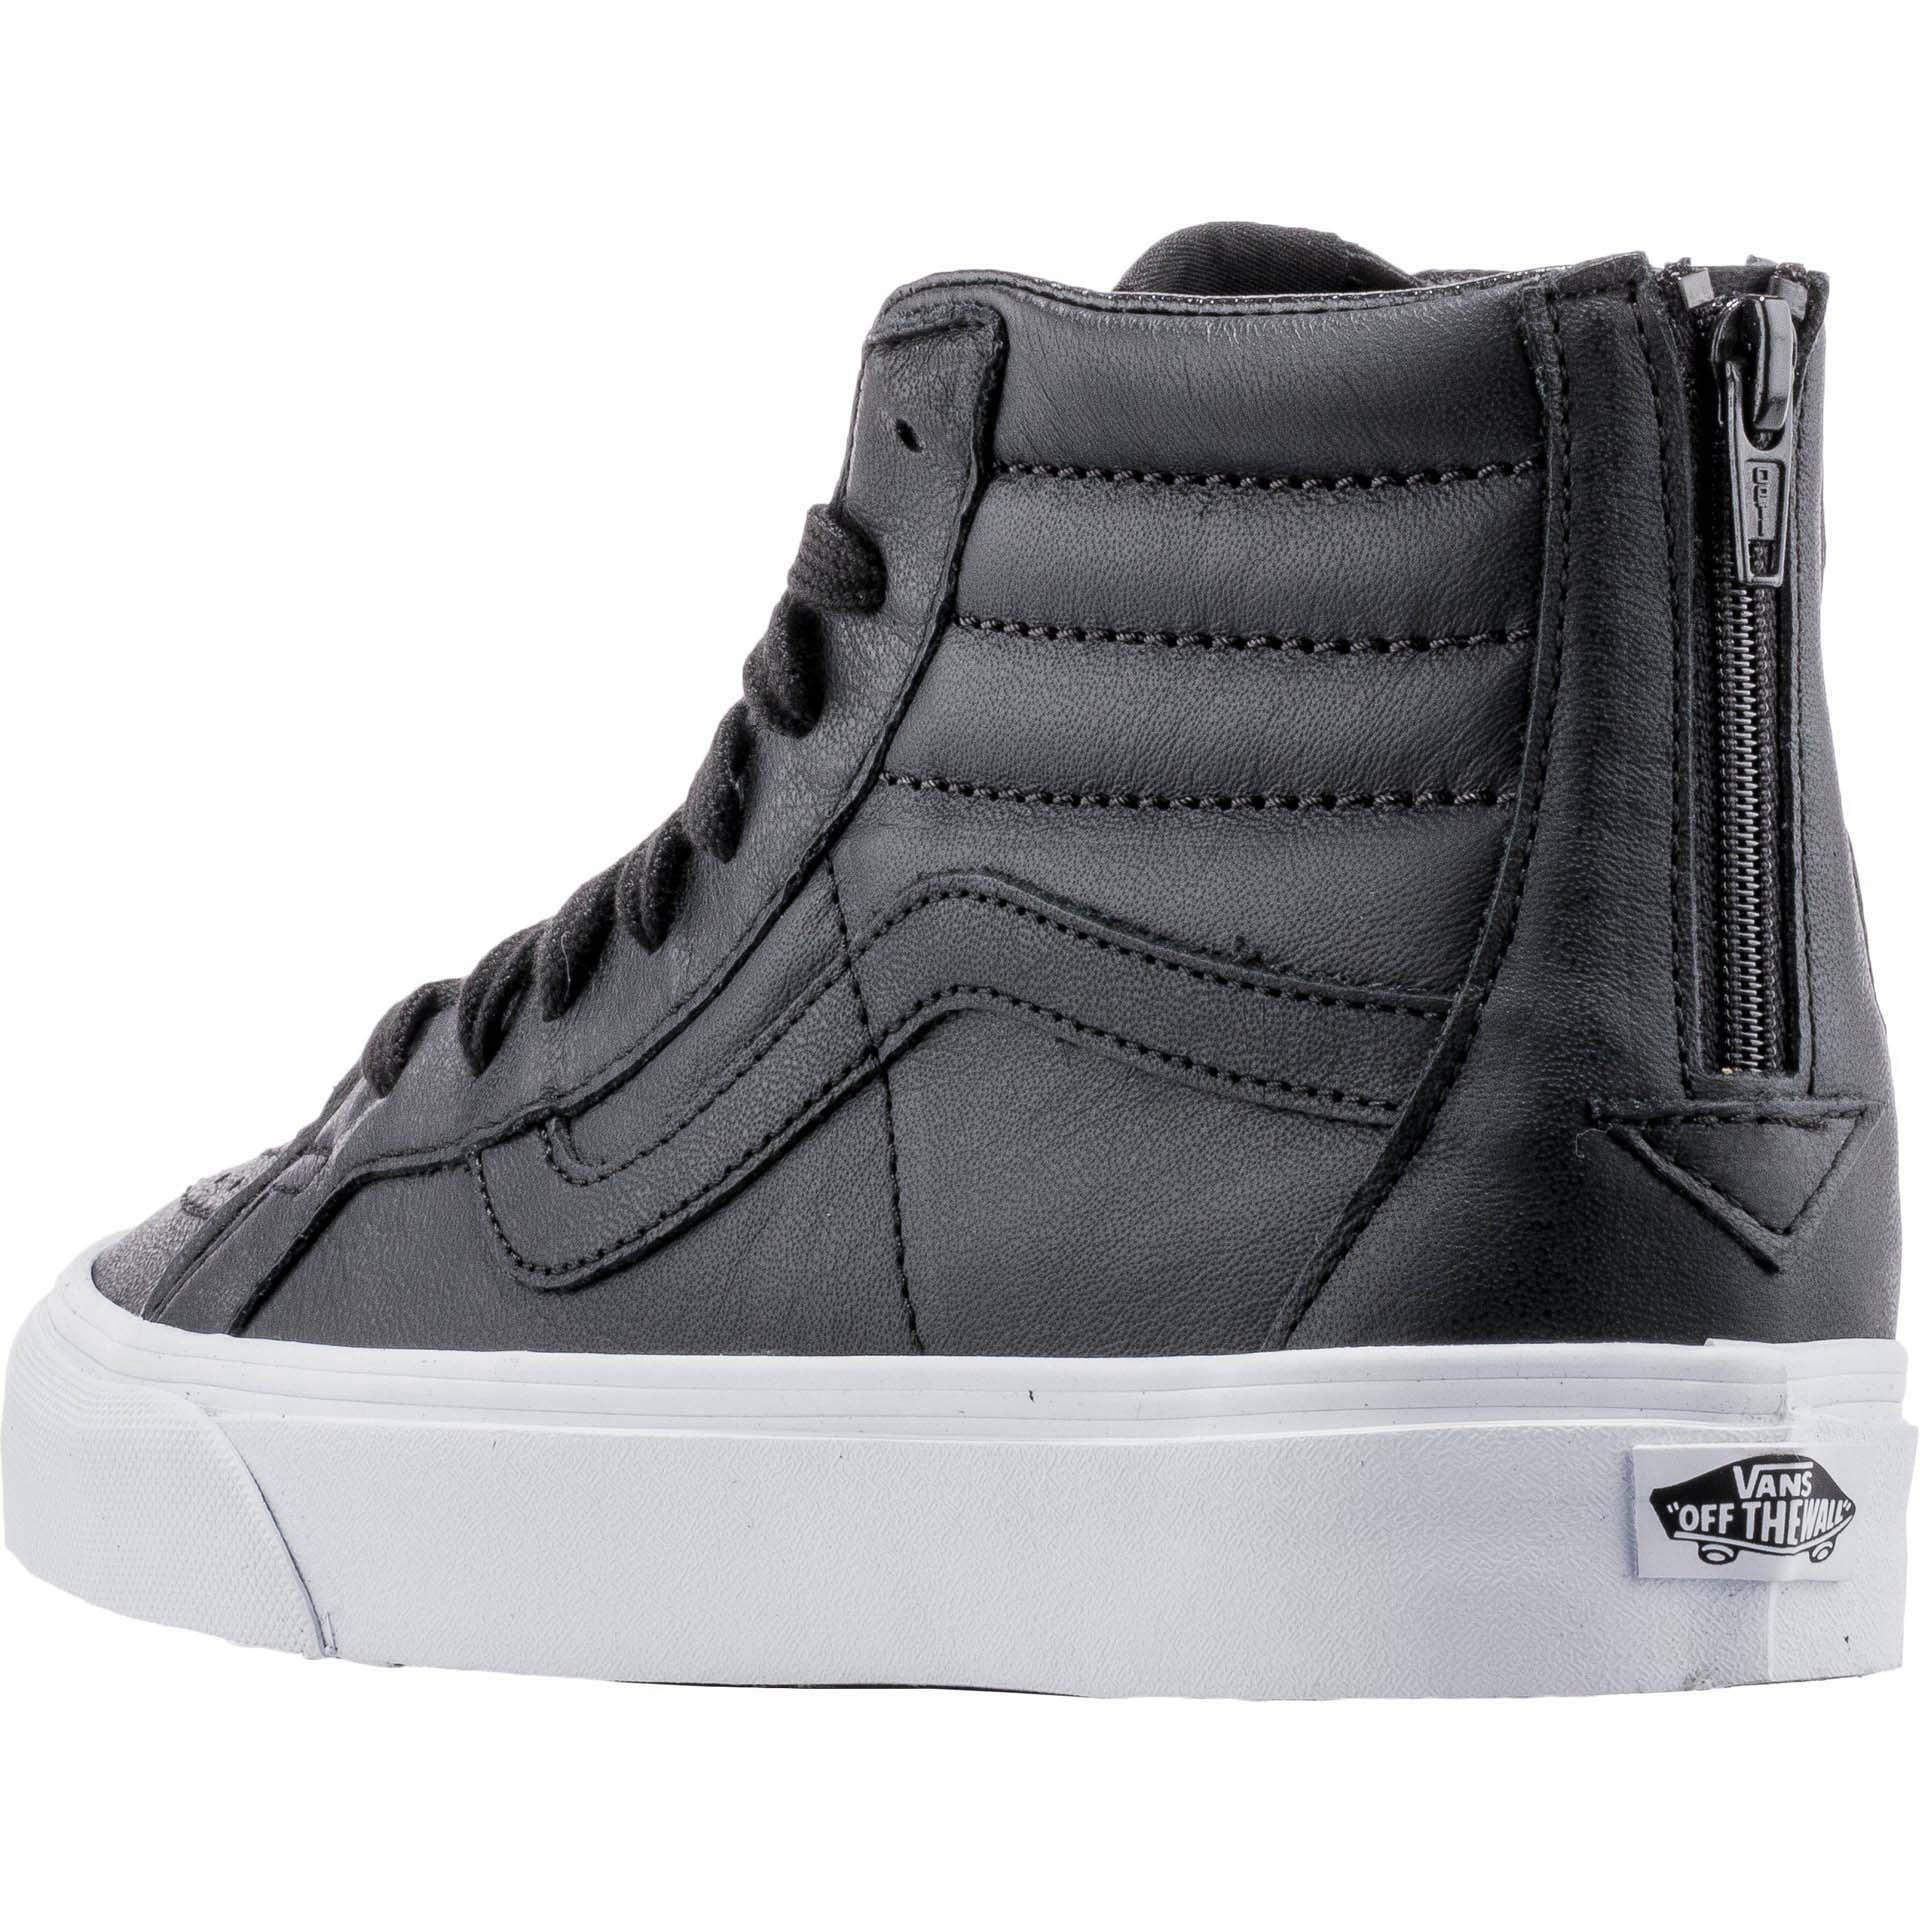 7cf12711b6 Vans - Vans SK8 Hi Reissue Zip Premium Leather Black Men s Skate Shoes Size  10 - Walmart.com